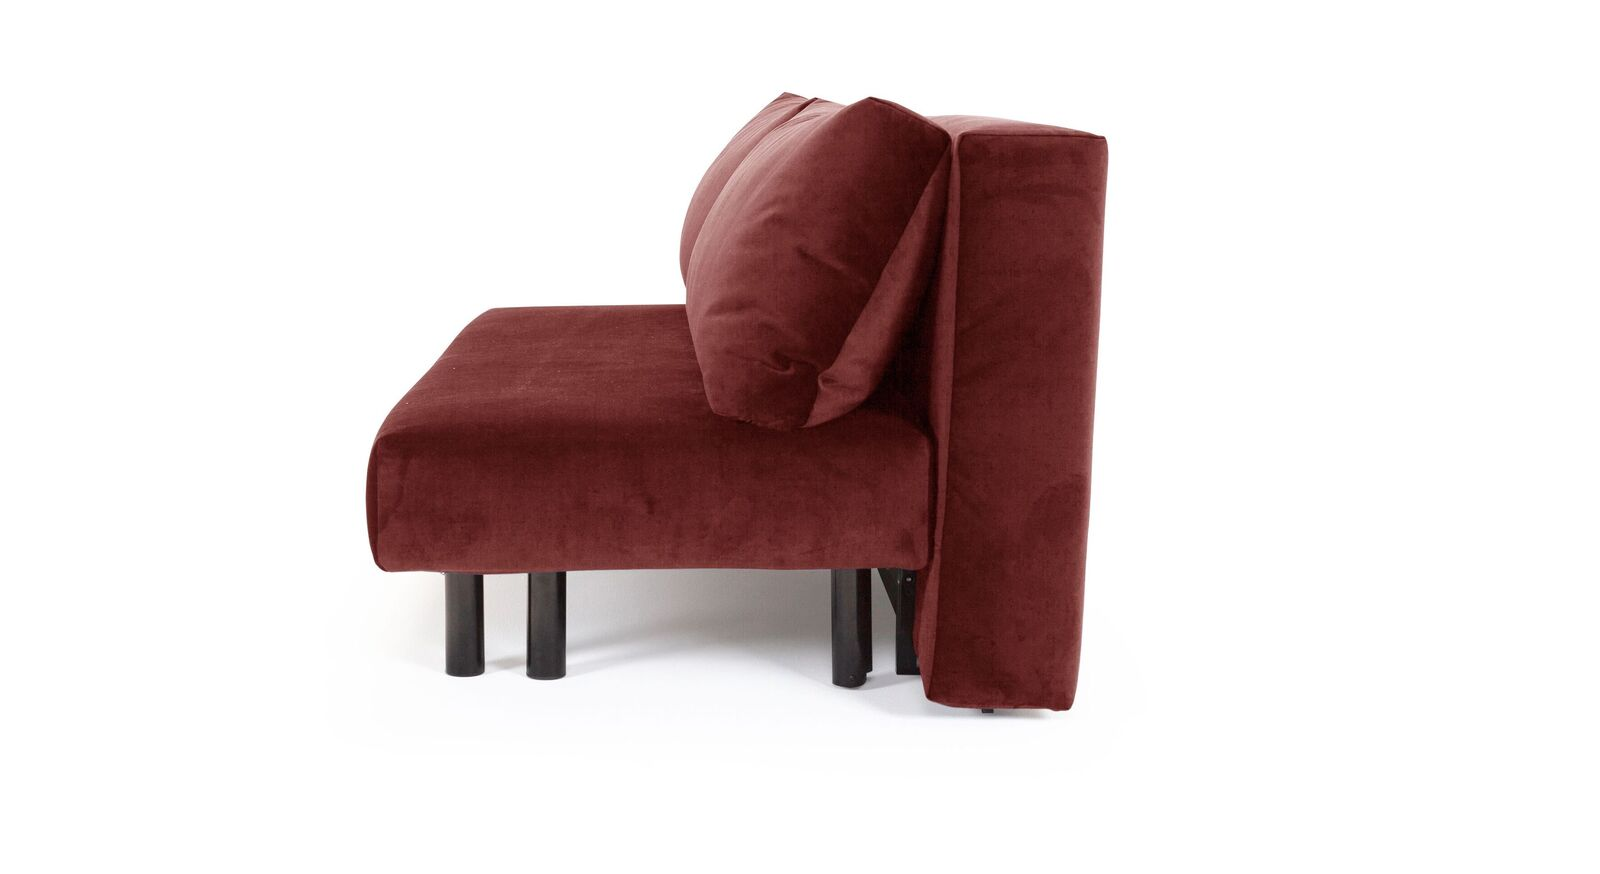 Modernes Schlafsofa Jenkis mit rotem Samtbezug